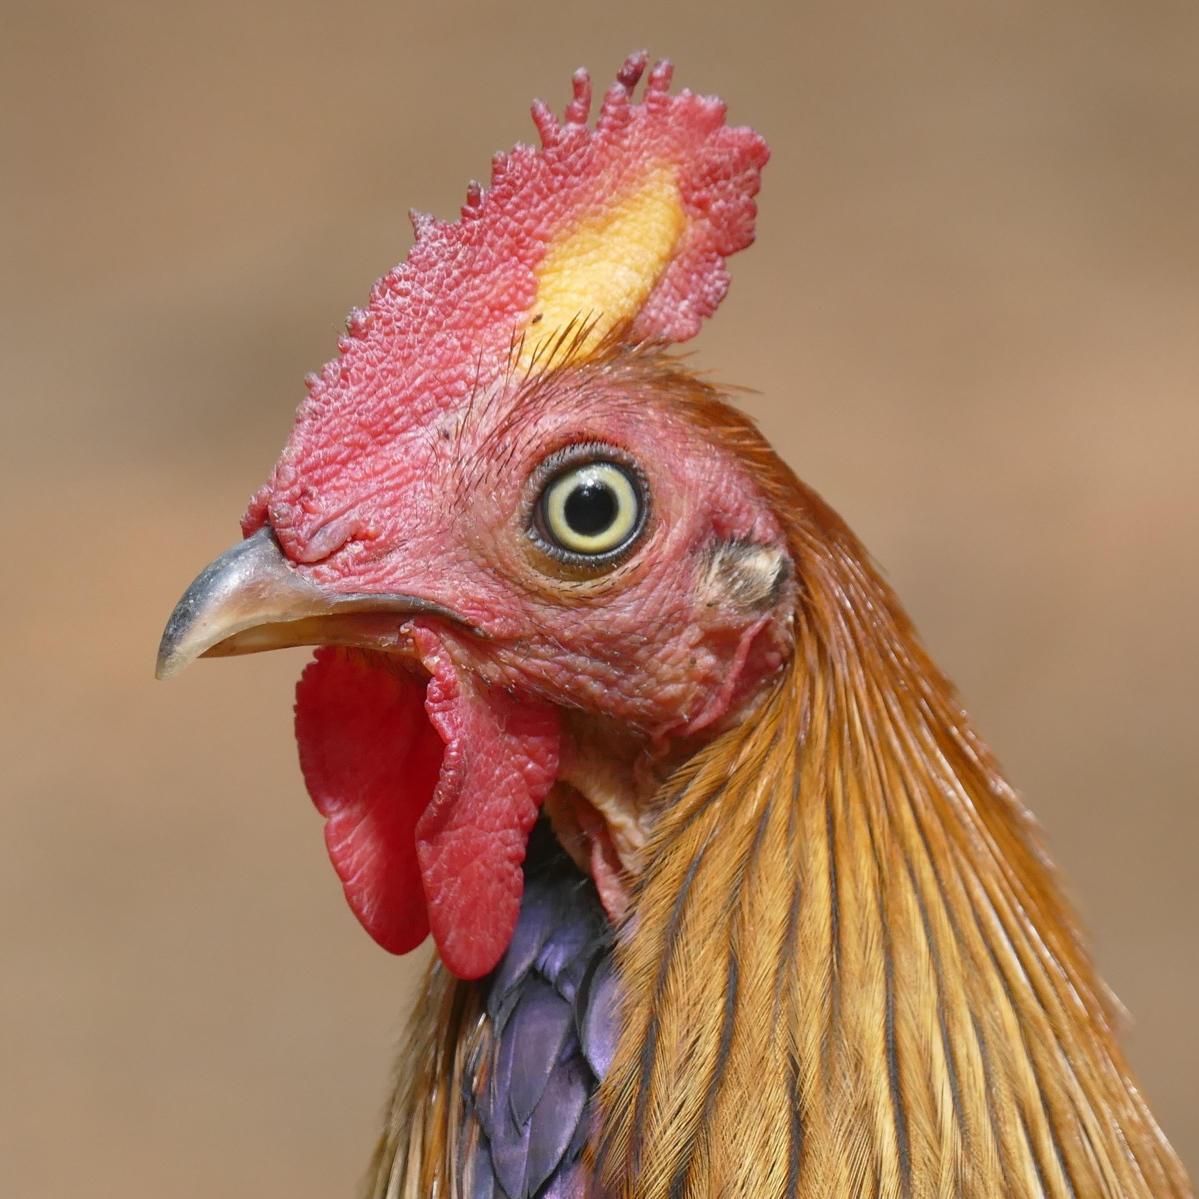 The Sri Lanka Junglefowl (a wild, native, endemic bird) looks just like a domestic chicken. Noah Strycker